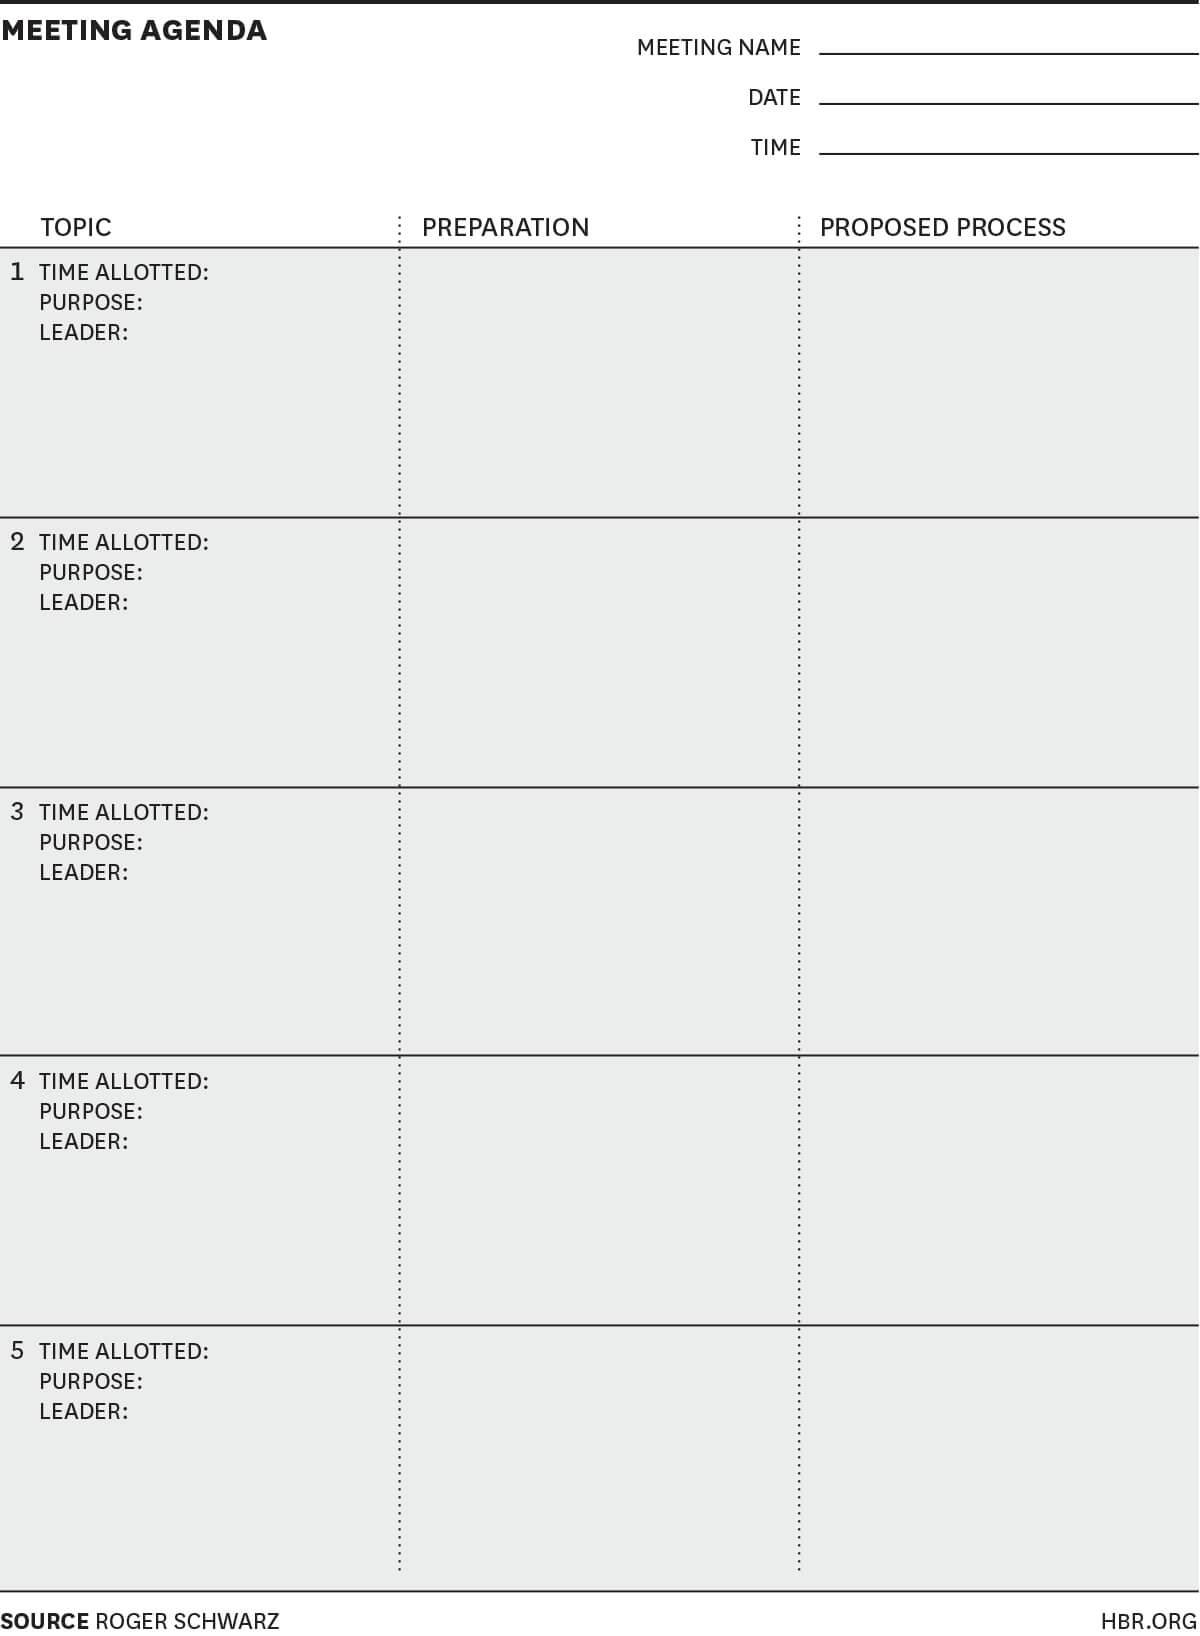 How To Design An Agenda For An Effective Meeting Throughout Business Development Meeting Agenda Template